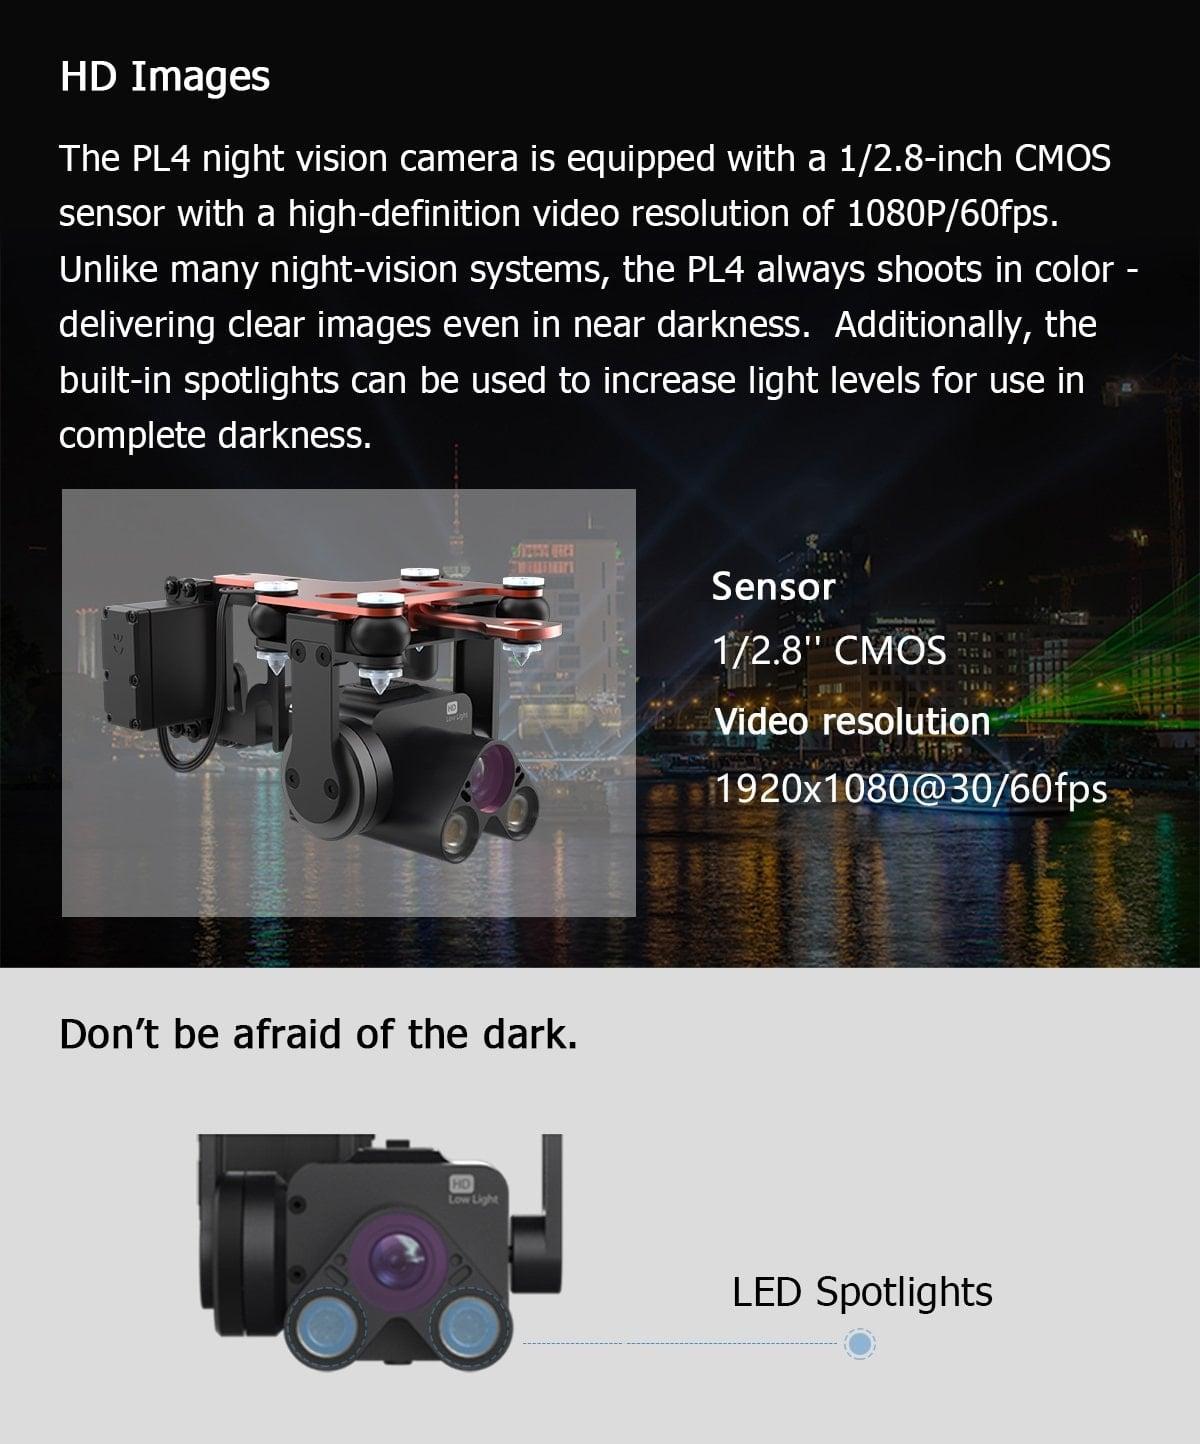 PL4 HD Images and Sensor